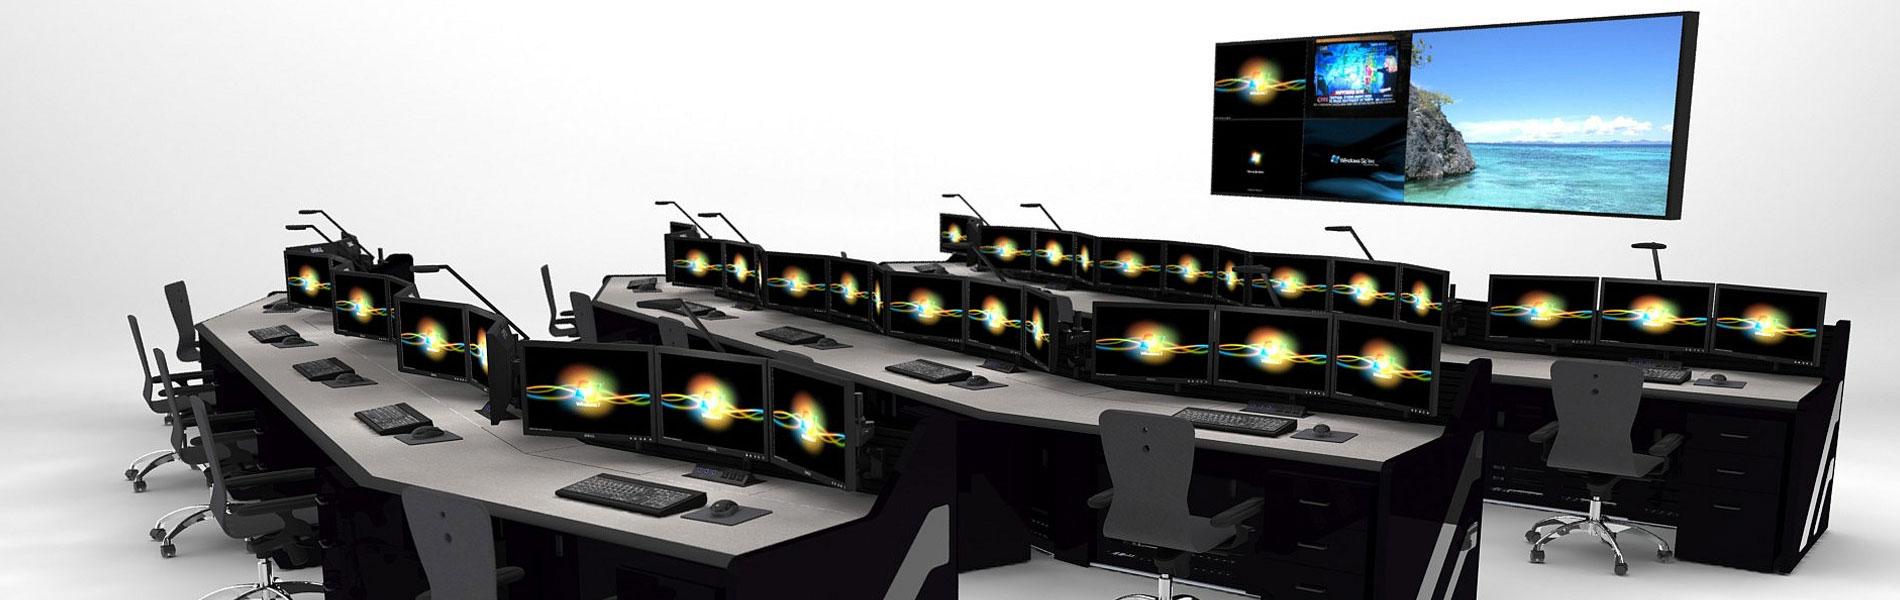 noc-data-center-furniture-solutions